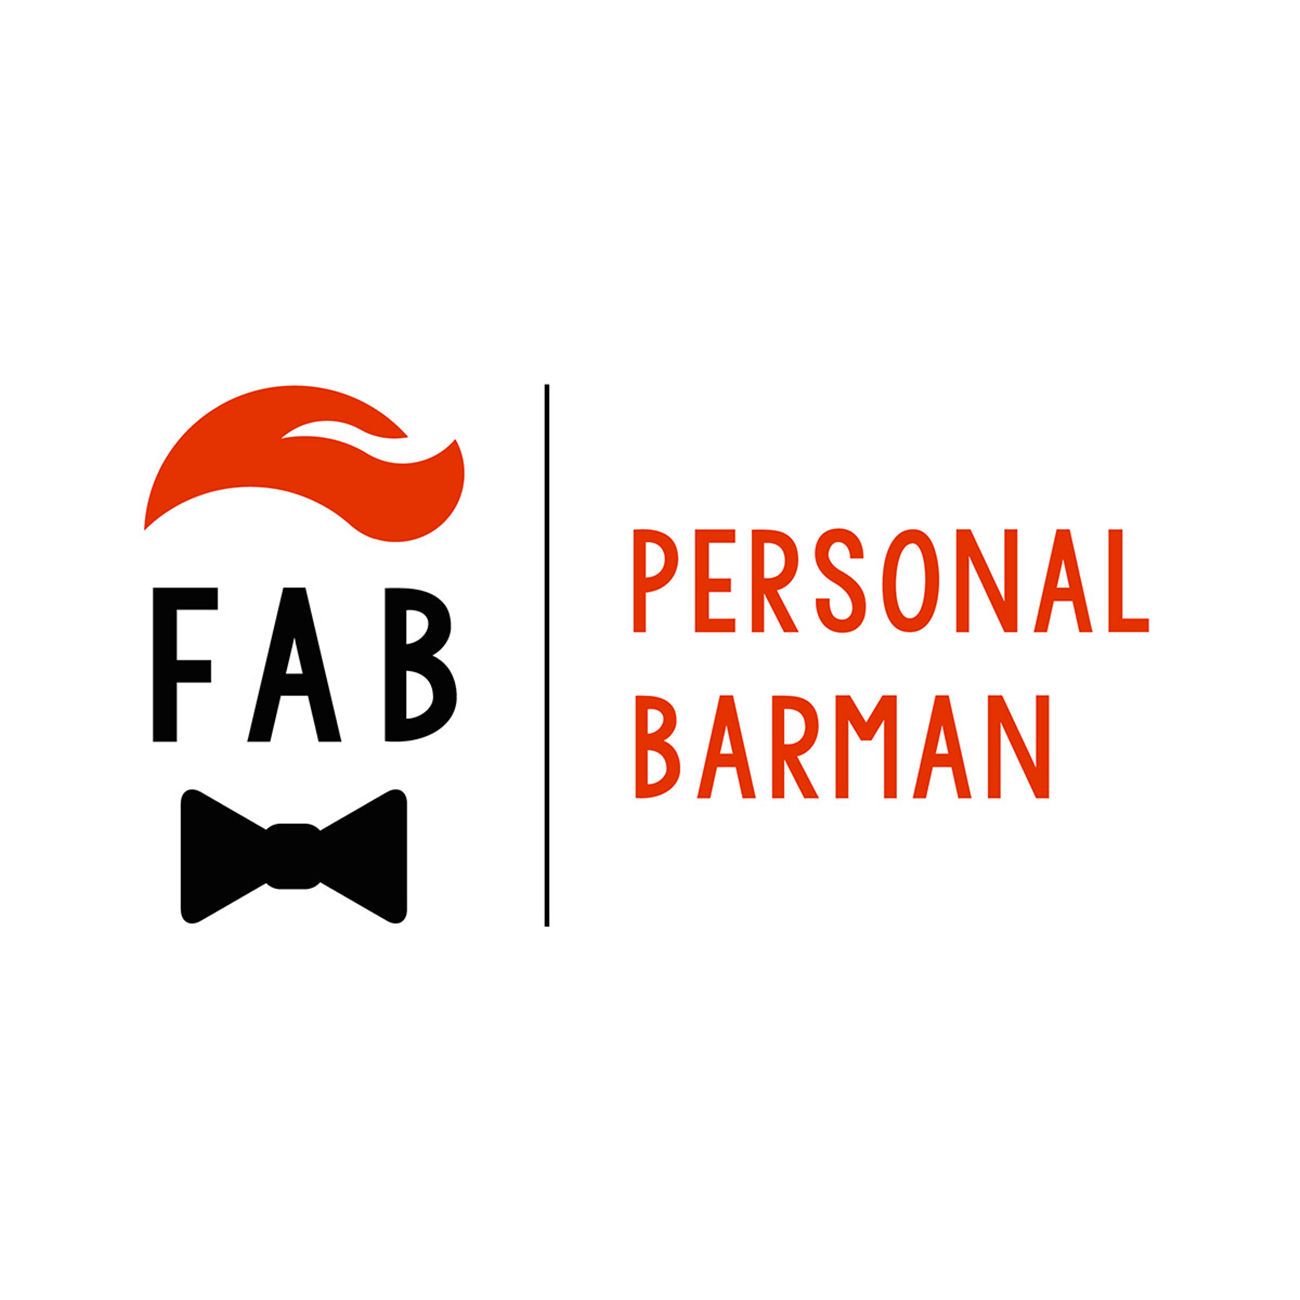 fab-personal-barman-logo